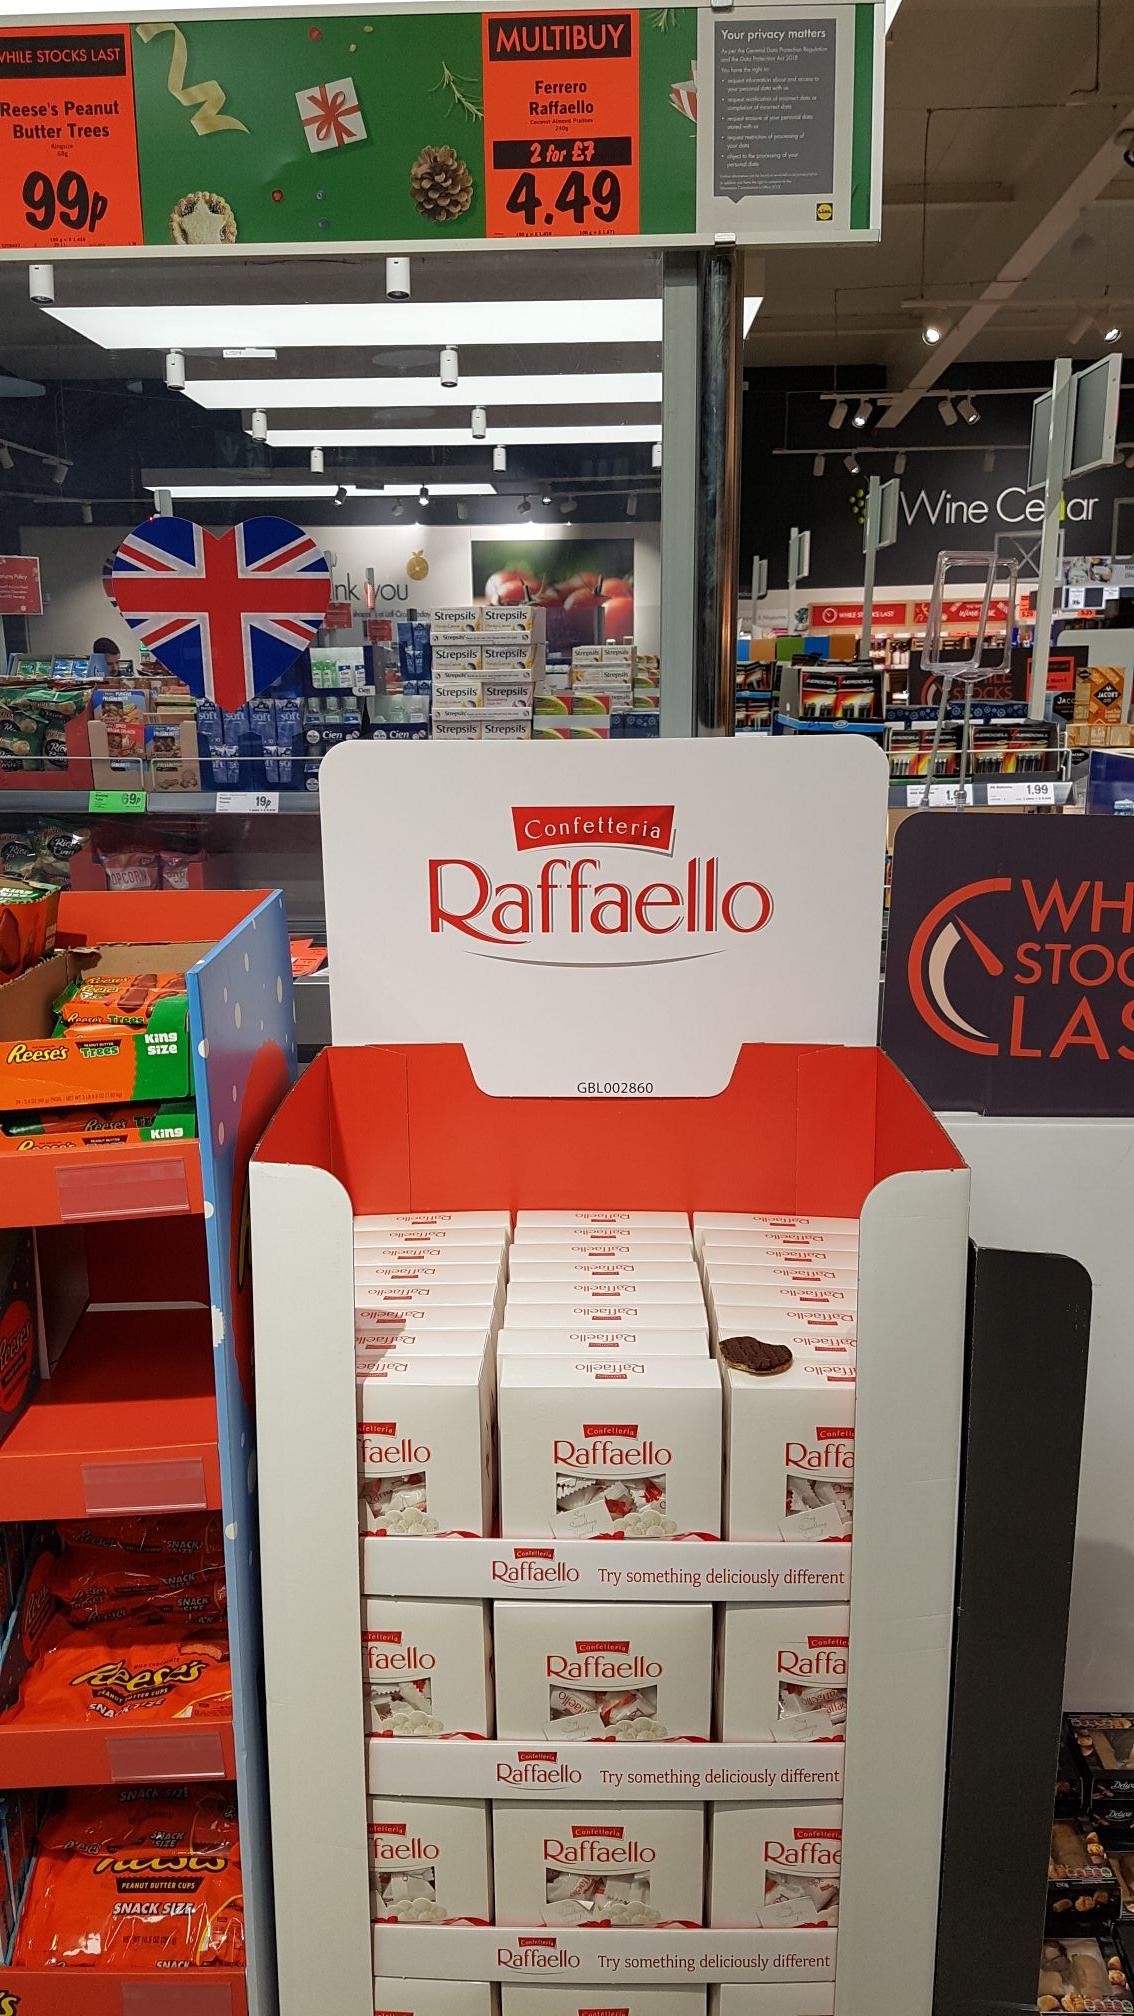 Raffaello - Lidl 2 for £7 240g each box